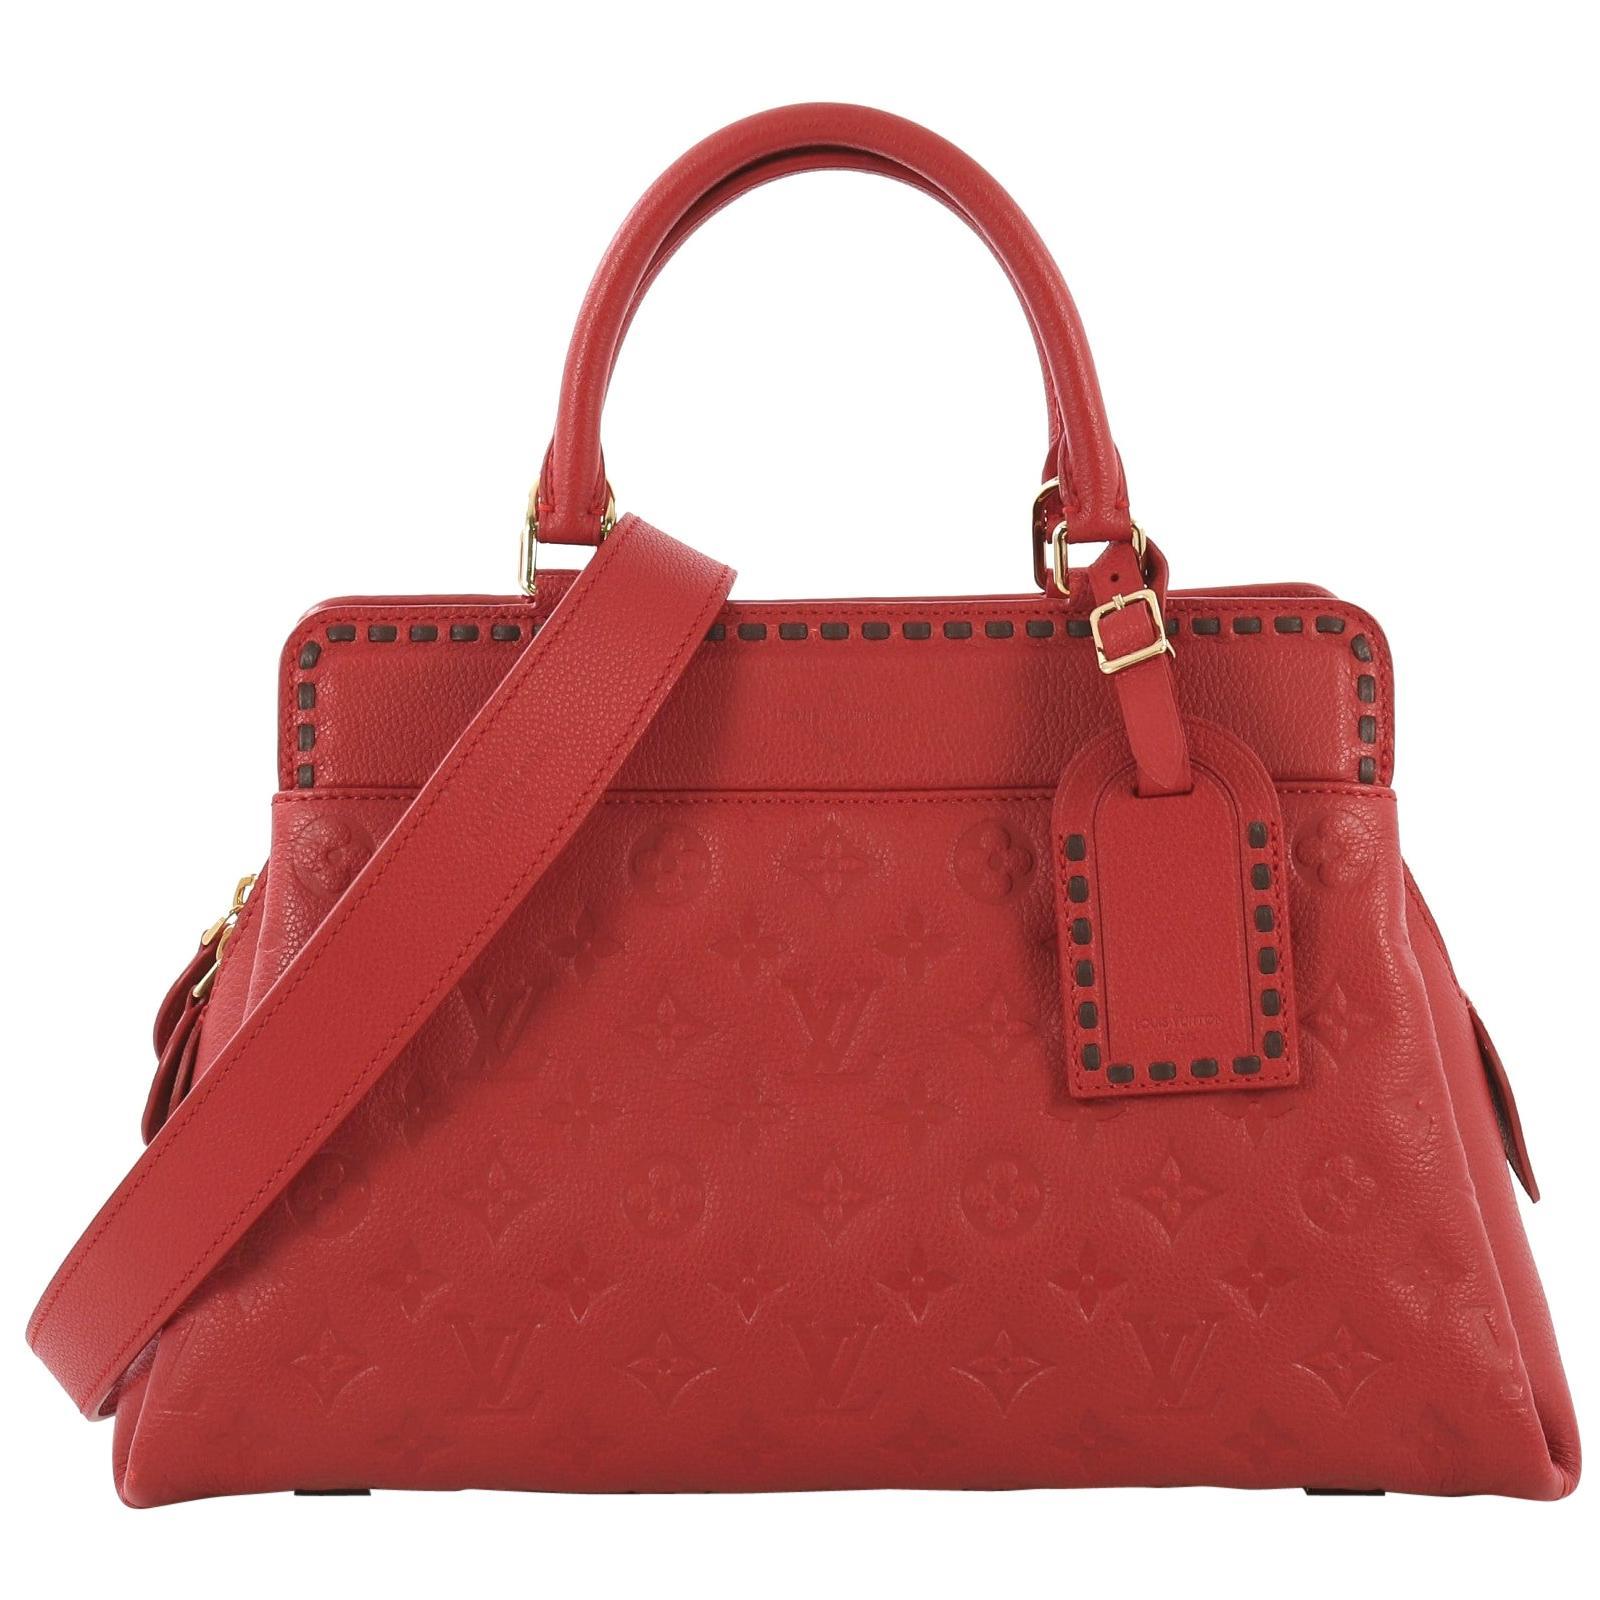 9907a7b377cf0e Louis Vuitton Speedy 30 Epi Red For Sale at 1stdibs